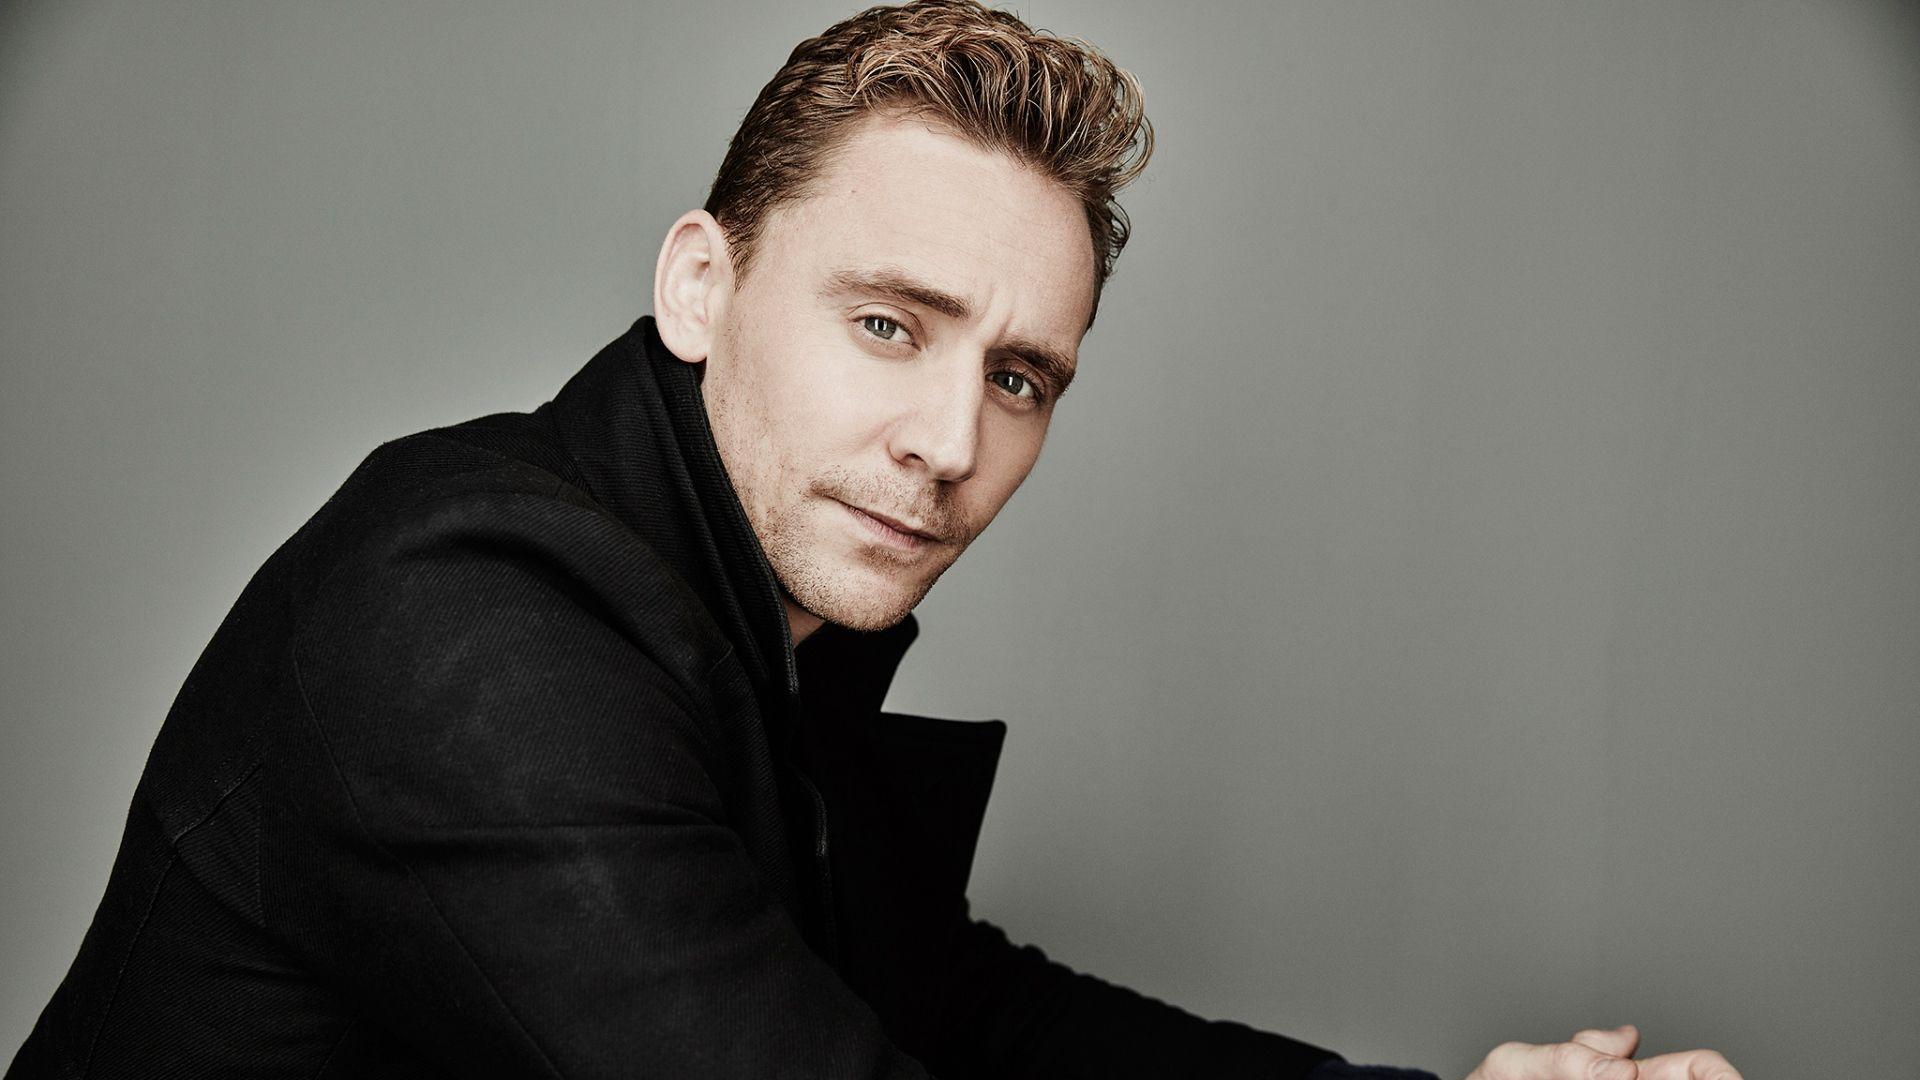 Tom Hiddleston Look